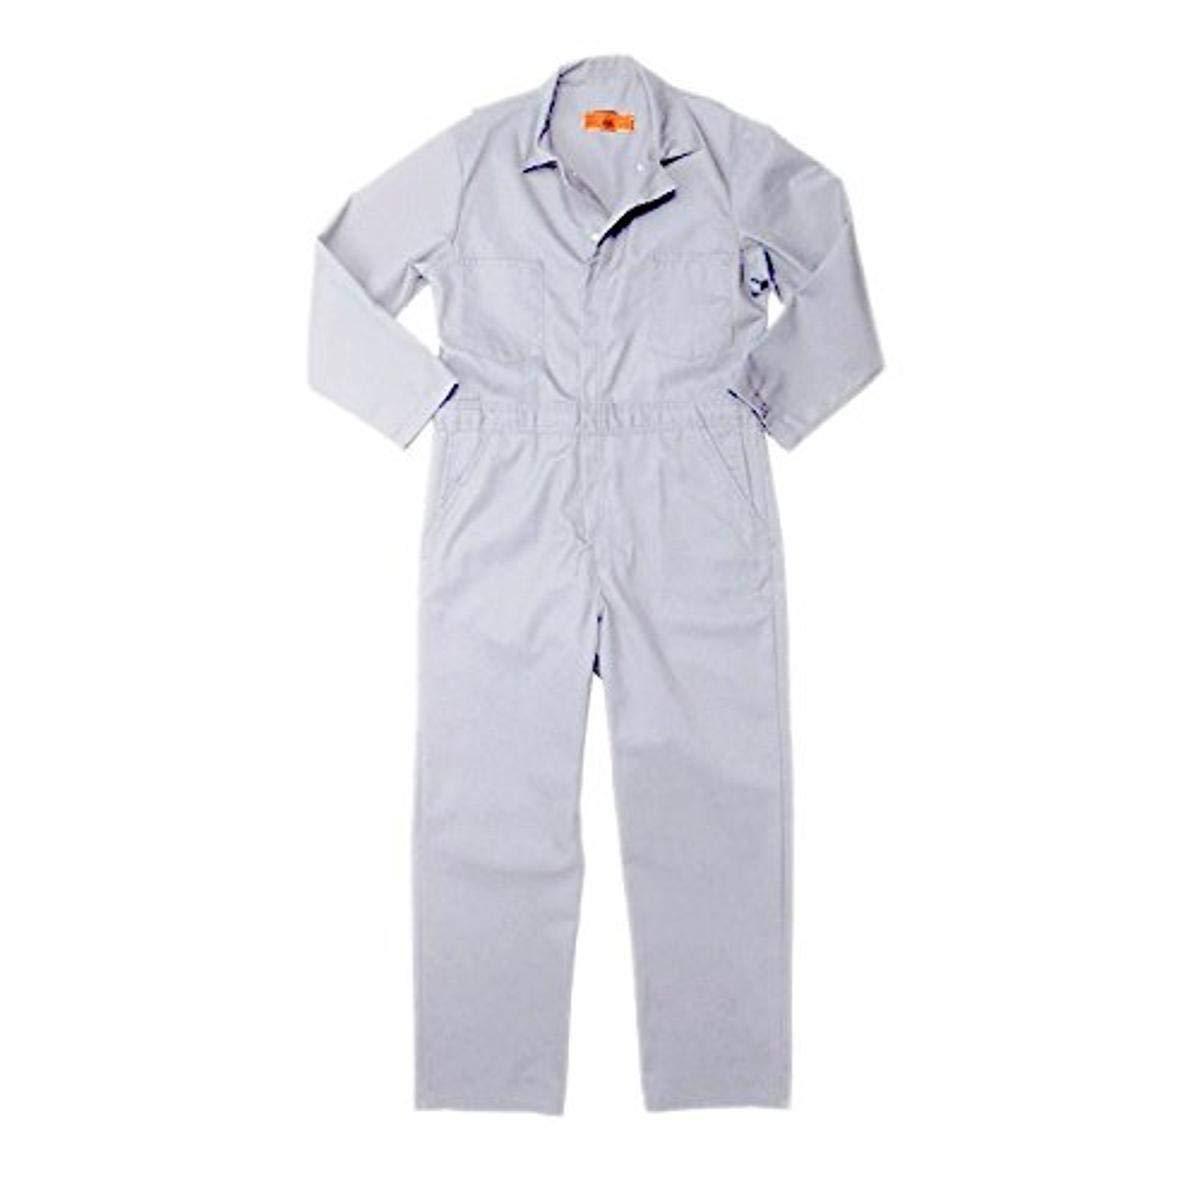 Pinnacle Textile CV10 7.5 OZ Max 83% OFF Twill Denver Mall COVER 35 65 Cotton Polyester